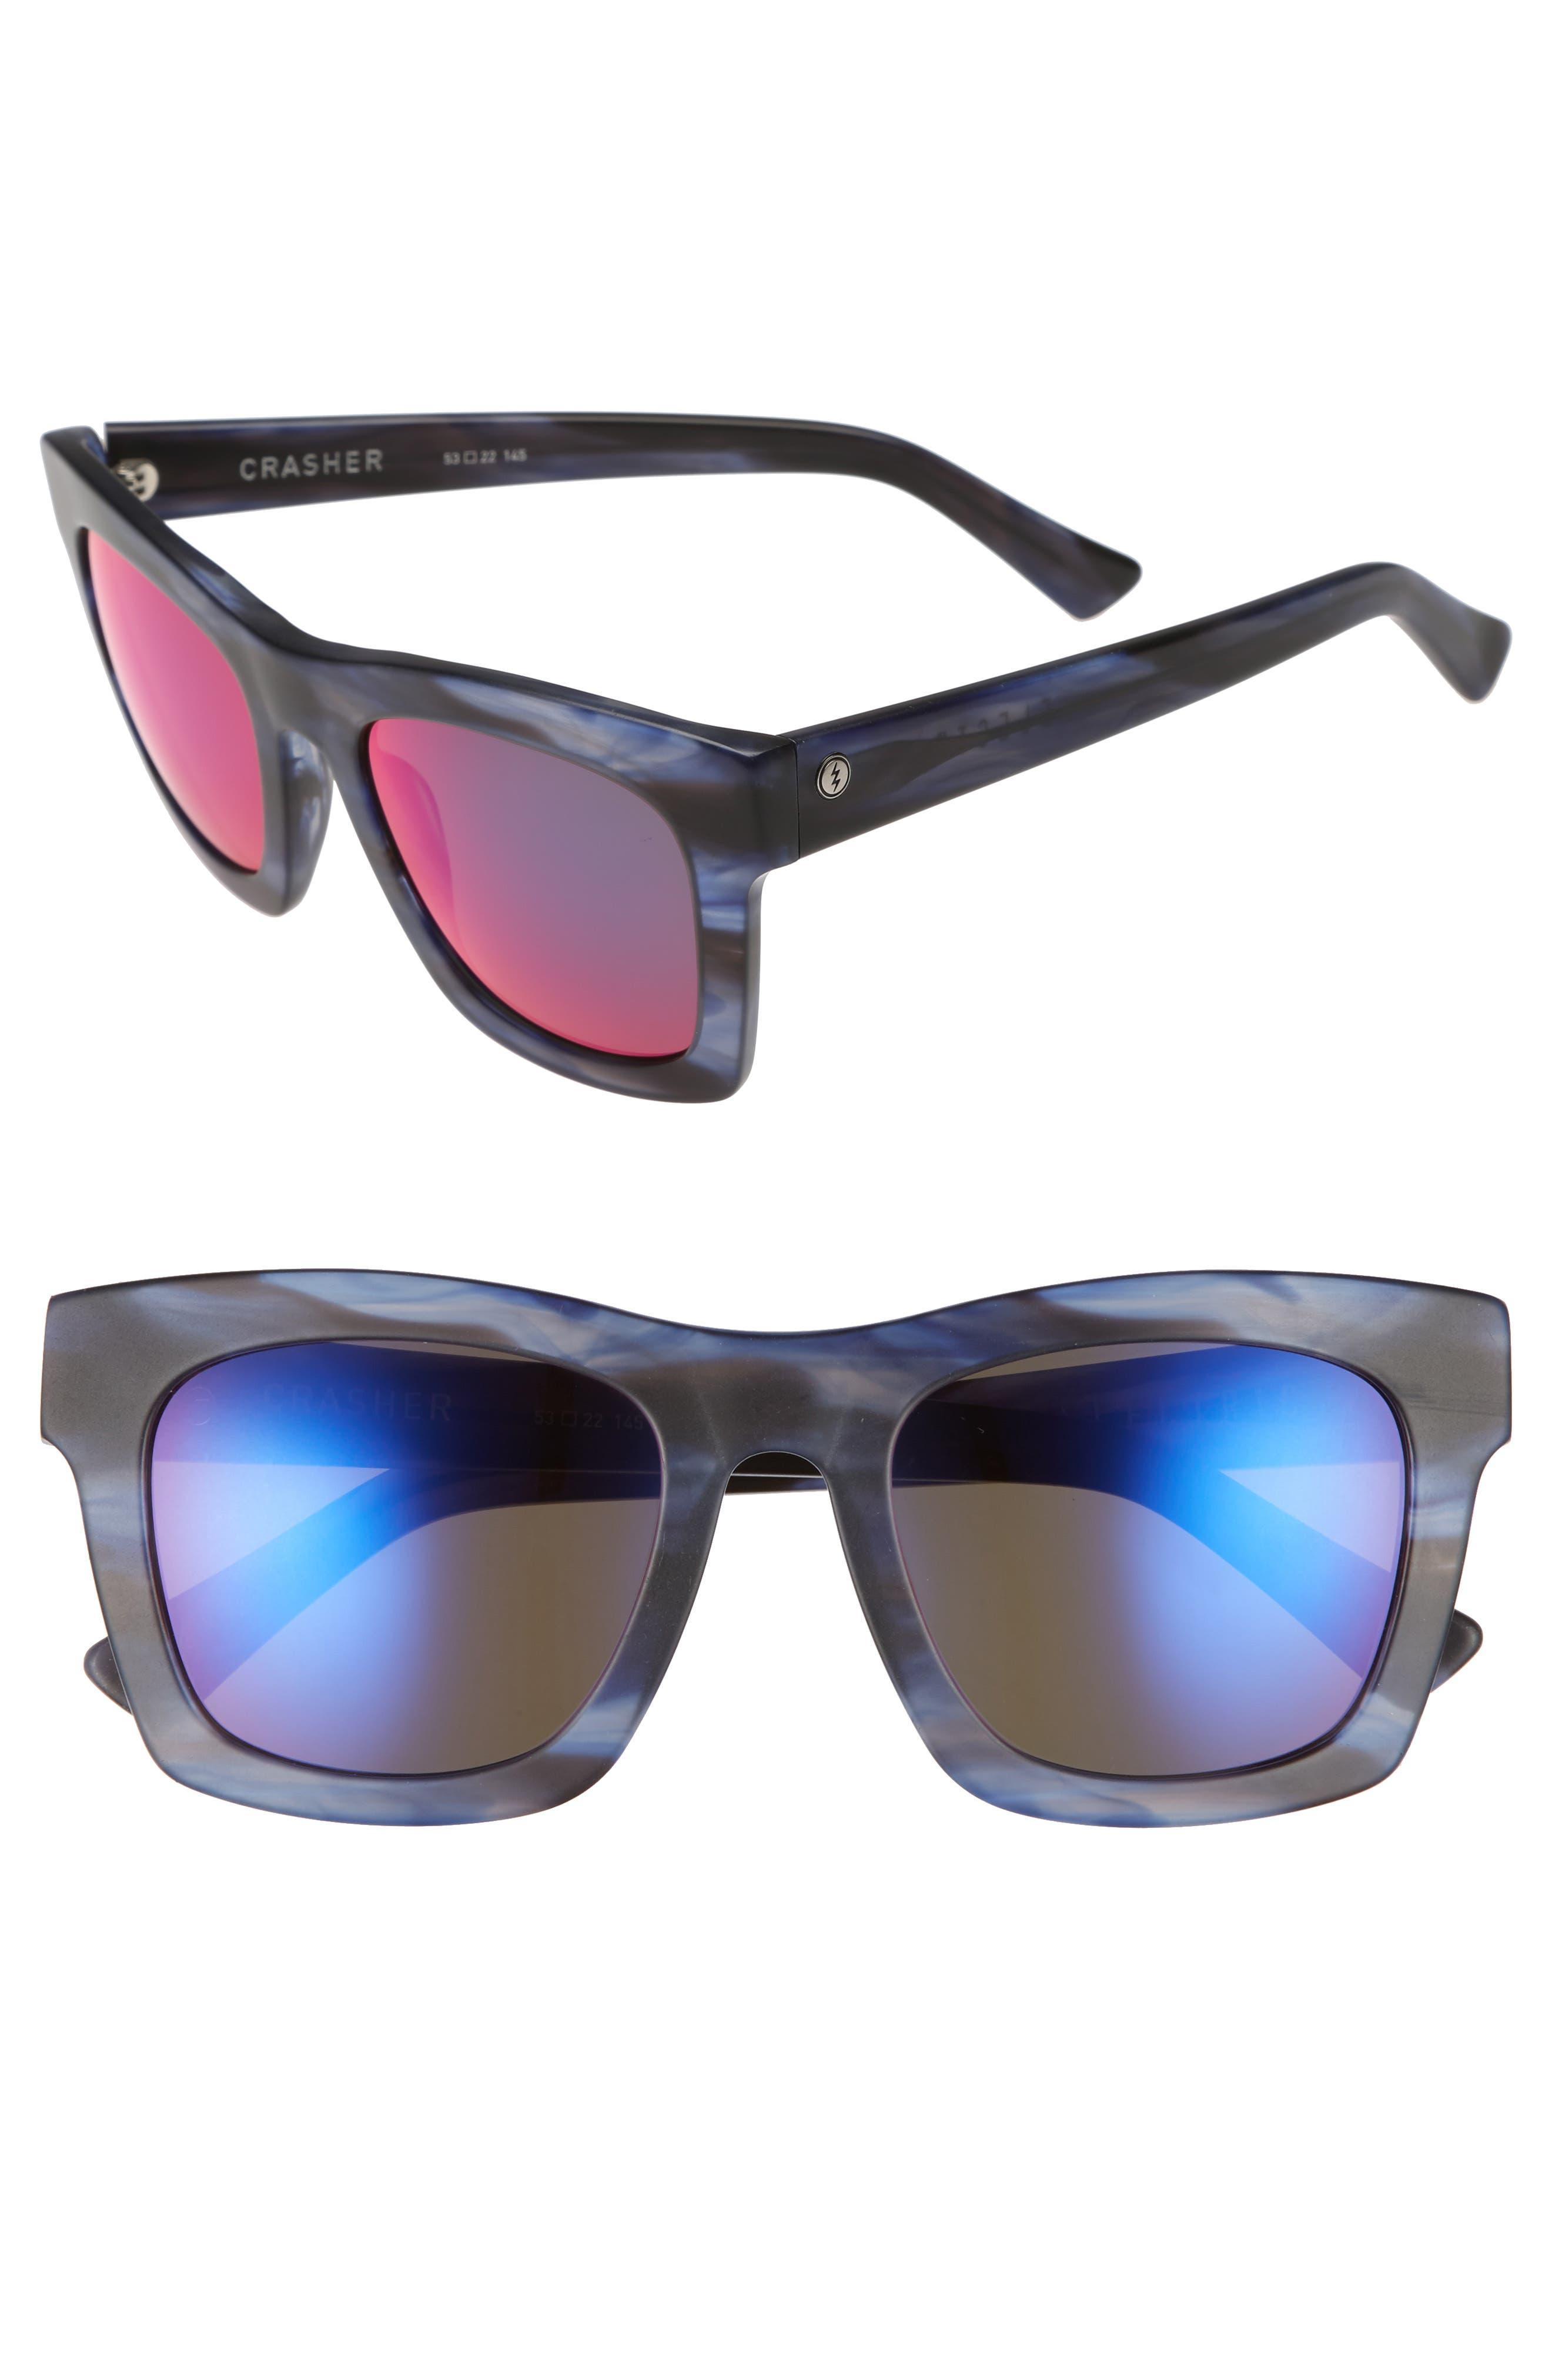 Crasher 53mm Mirrored Sunglasses,                         Main,                         color, Skyline/ Plasma